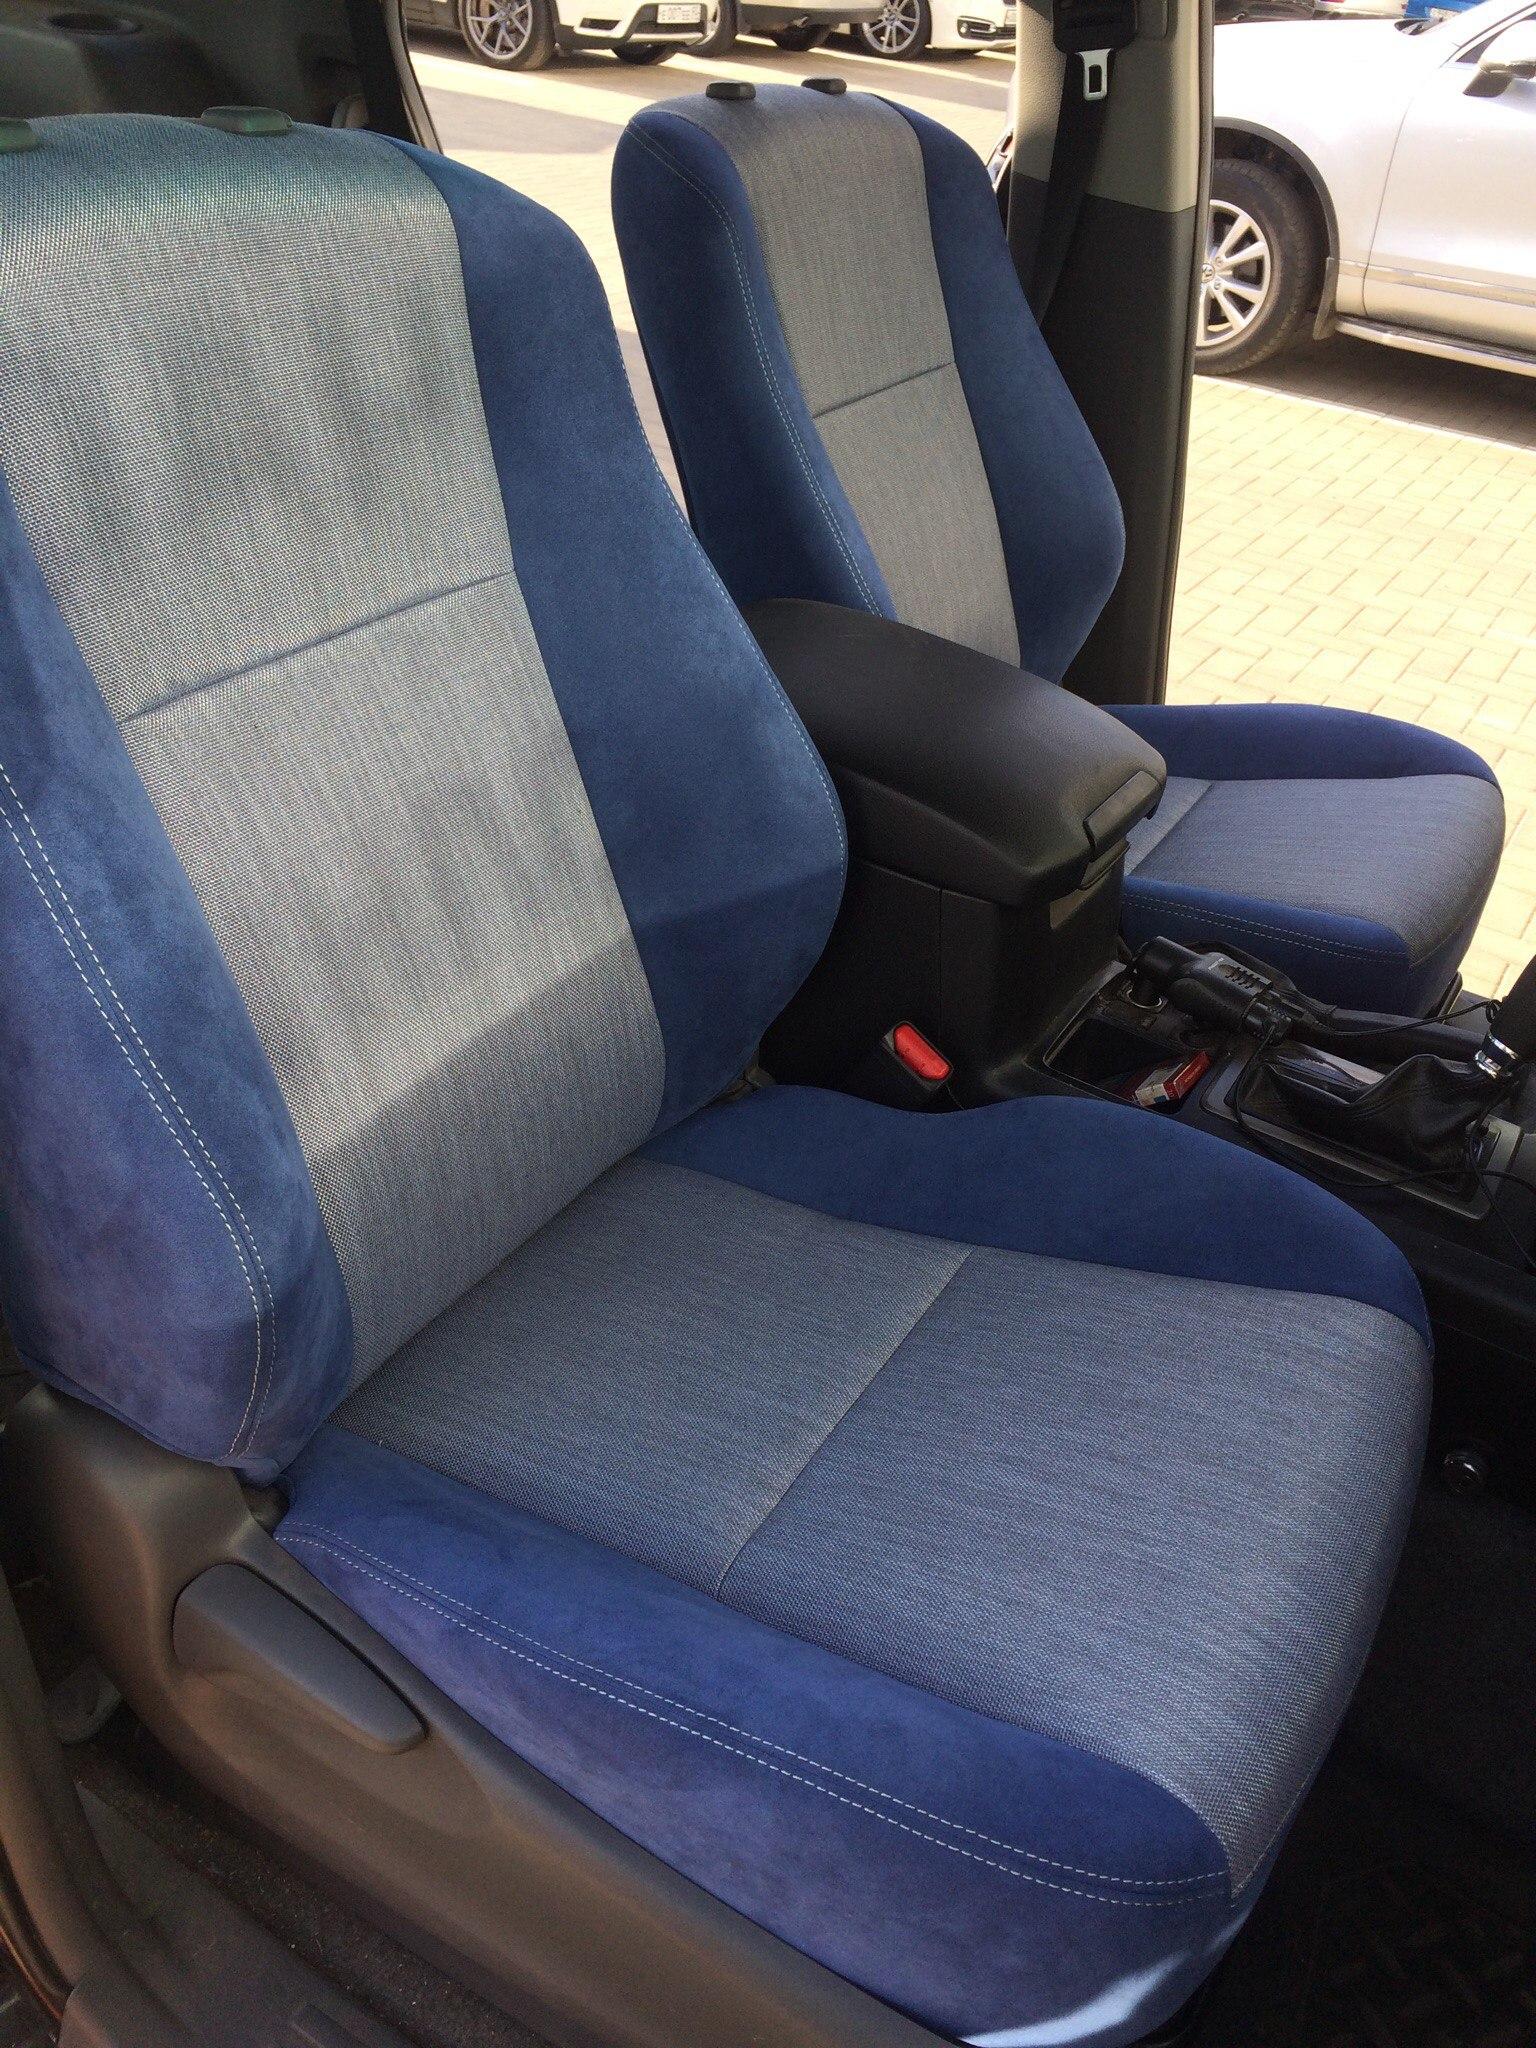 Ремонт обивки сидений автомобиля своими руками фото 941